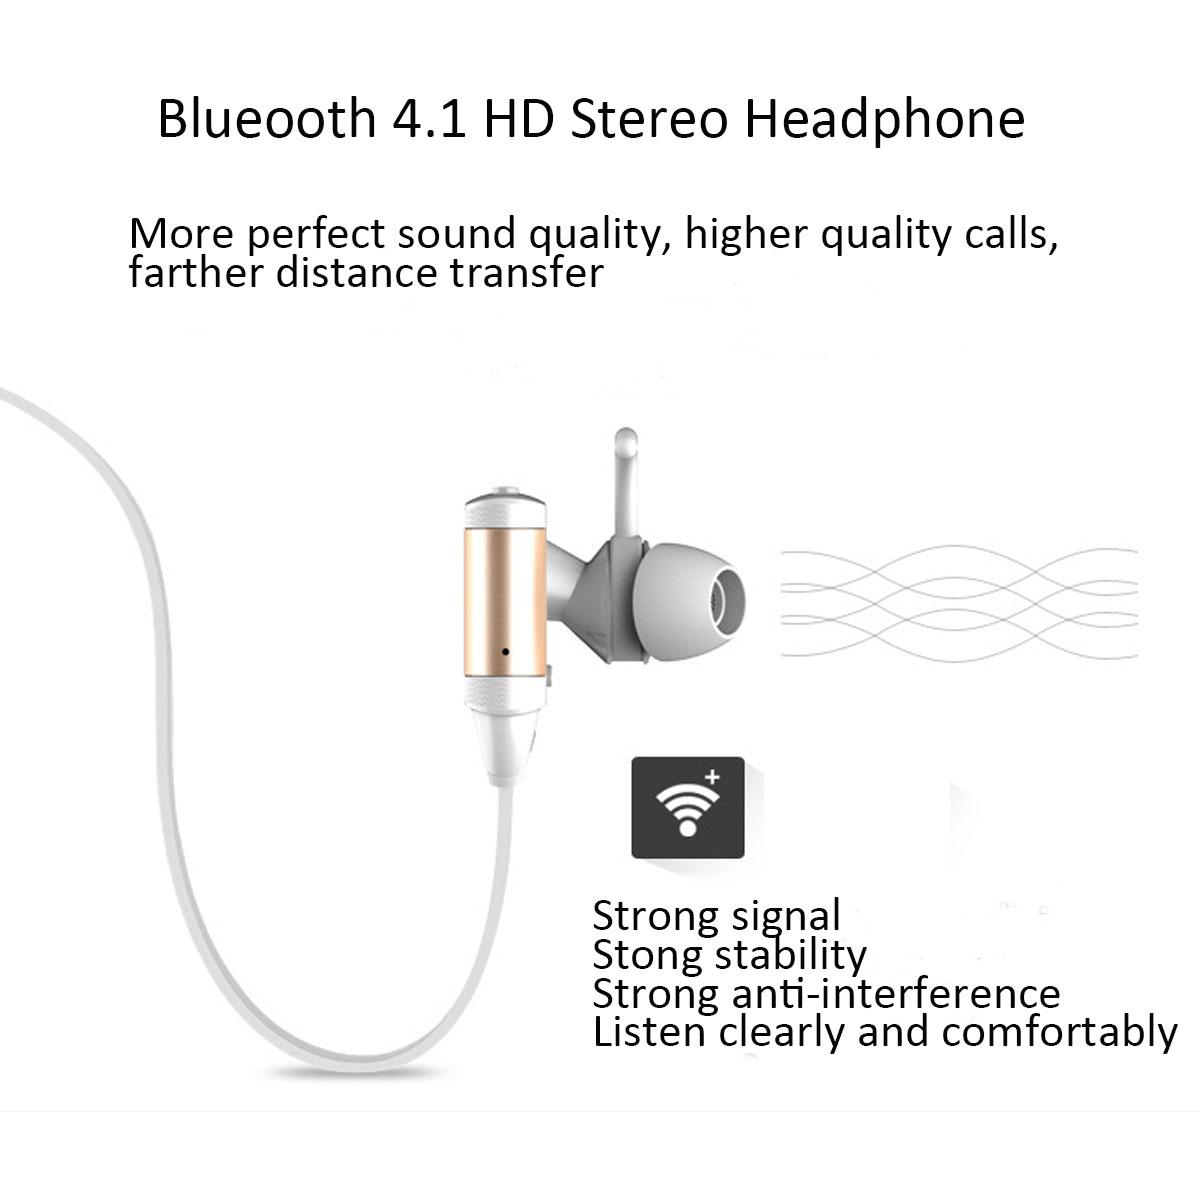 ... Auriculares Inalámbrico Bluetooth 4.1 Estéreo Manos Libre Para